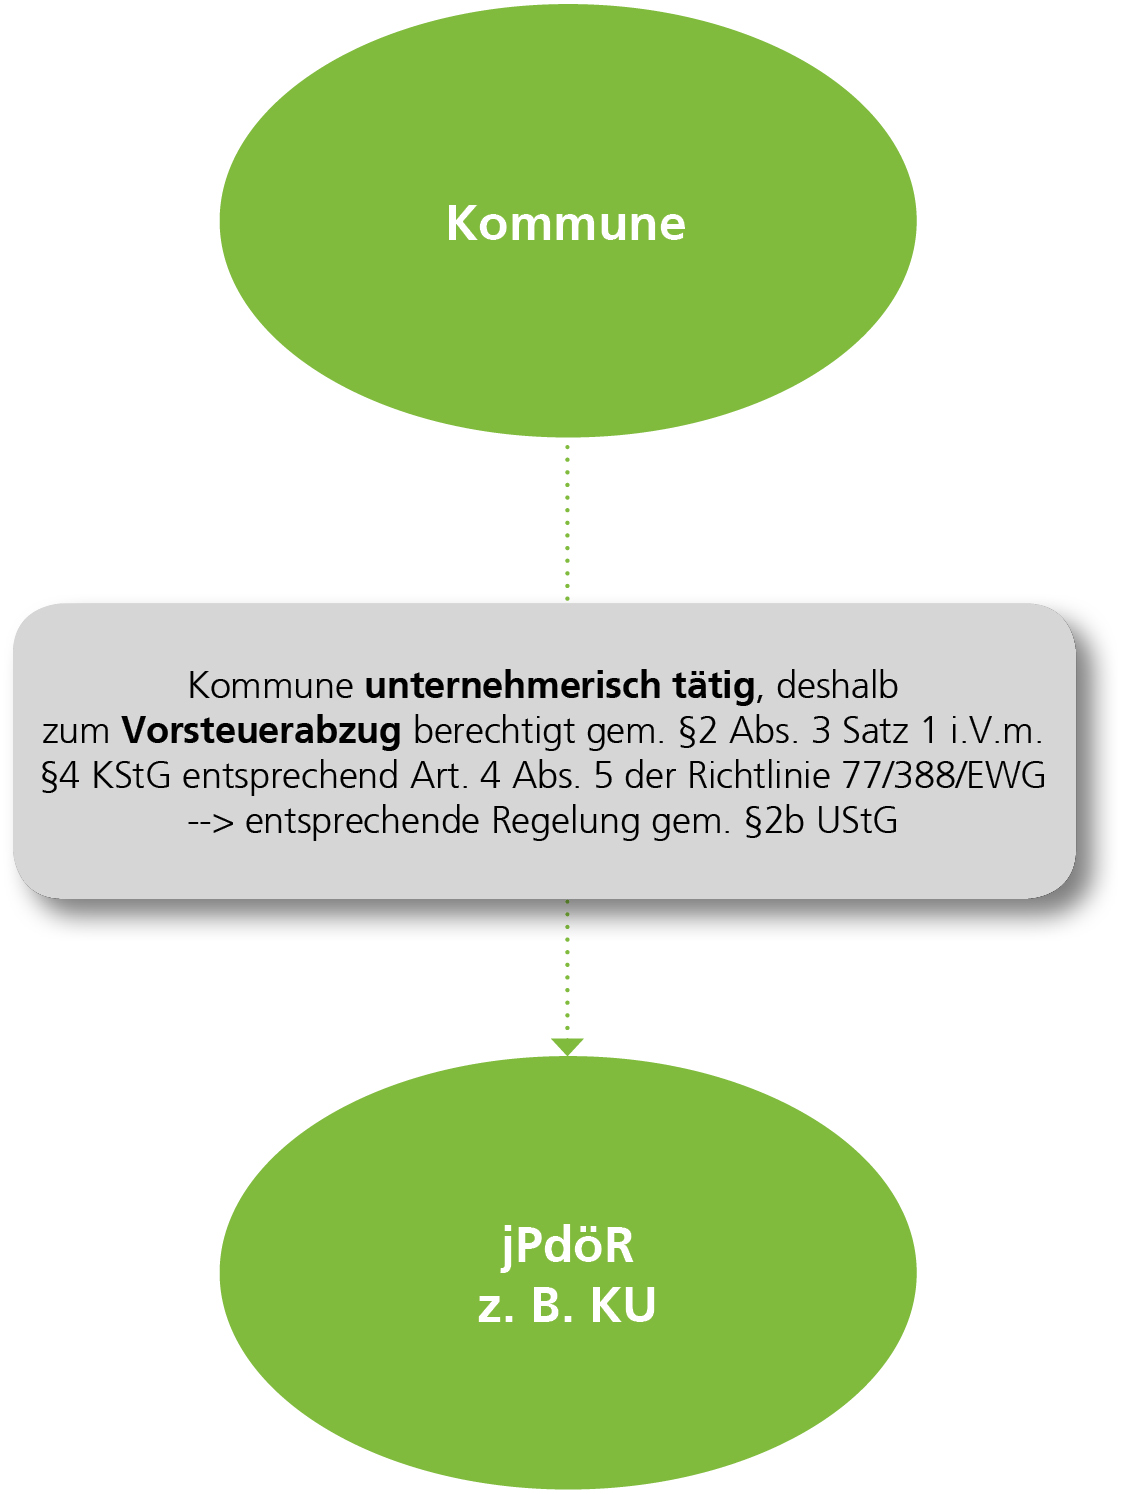 Masterarbeit 2b ustg online plagiarism checker for free